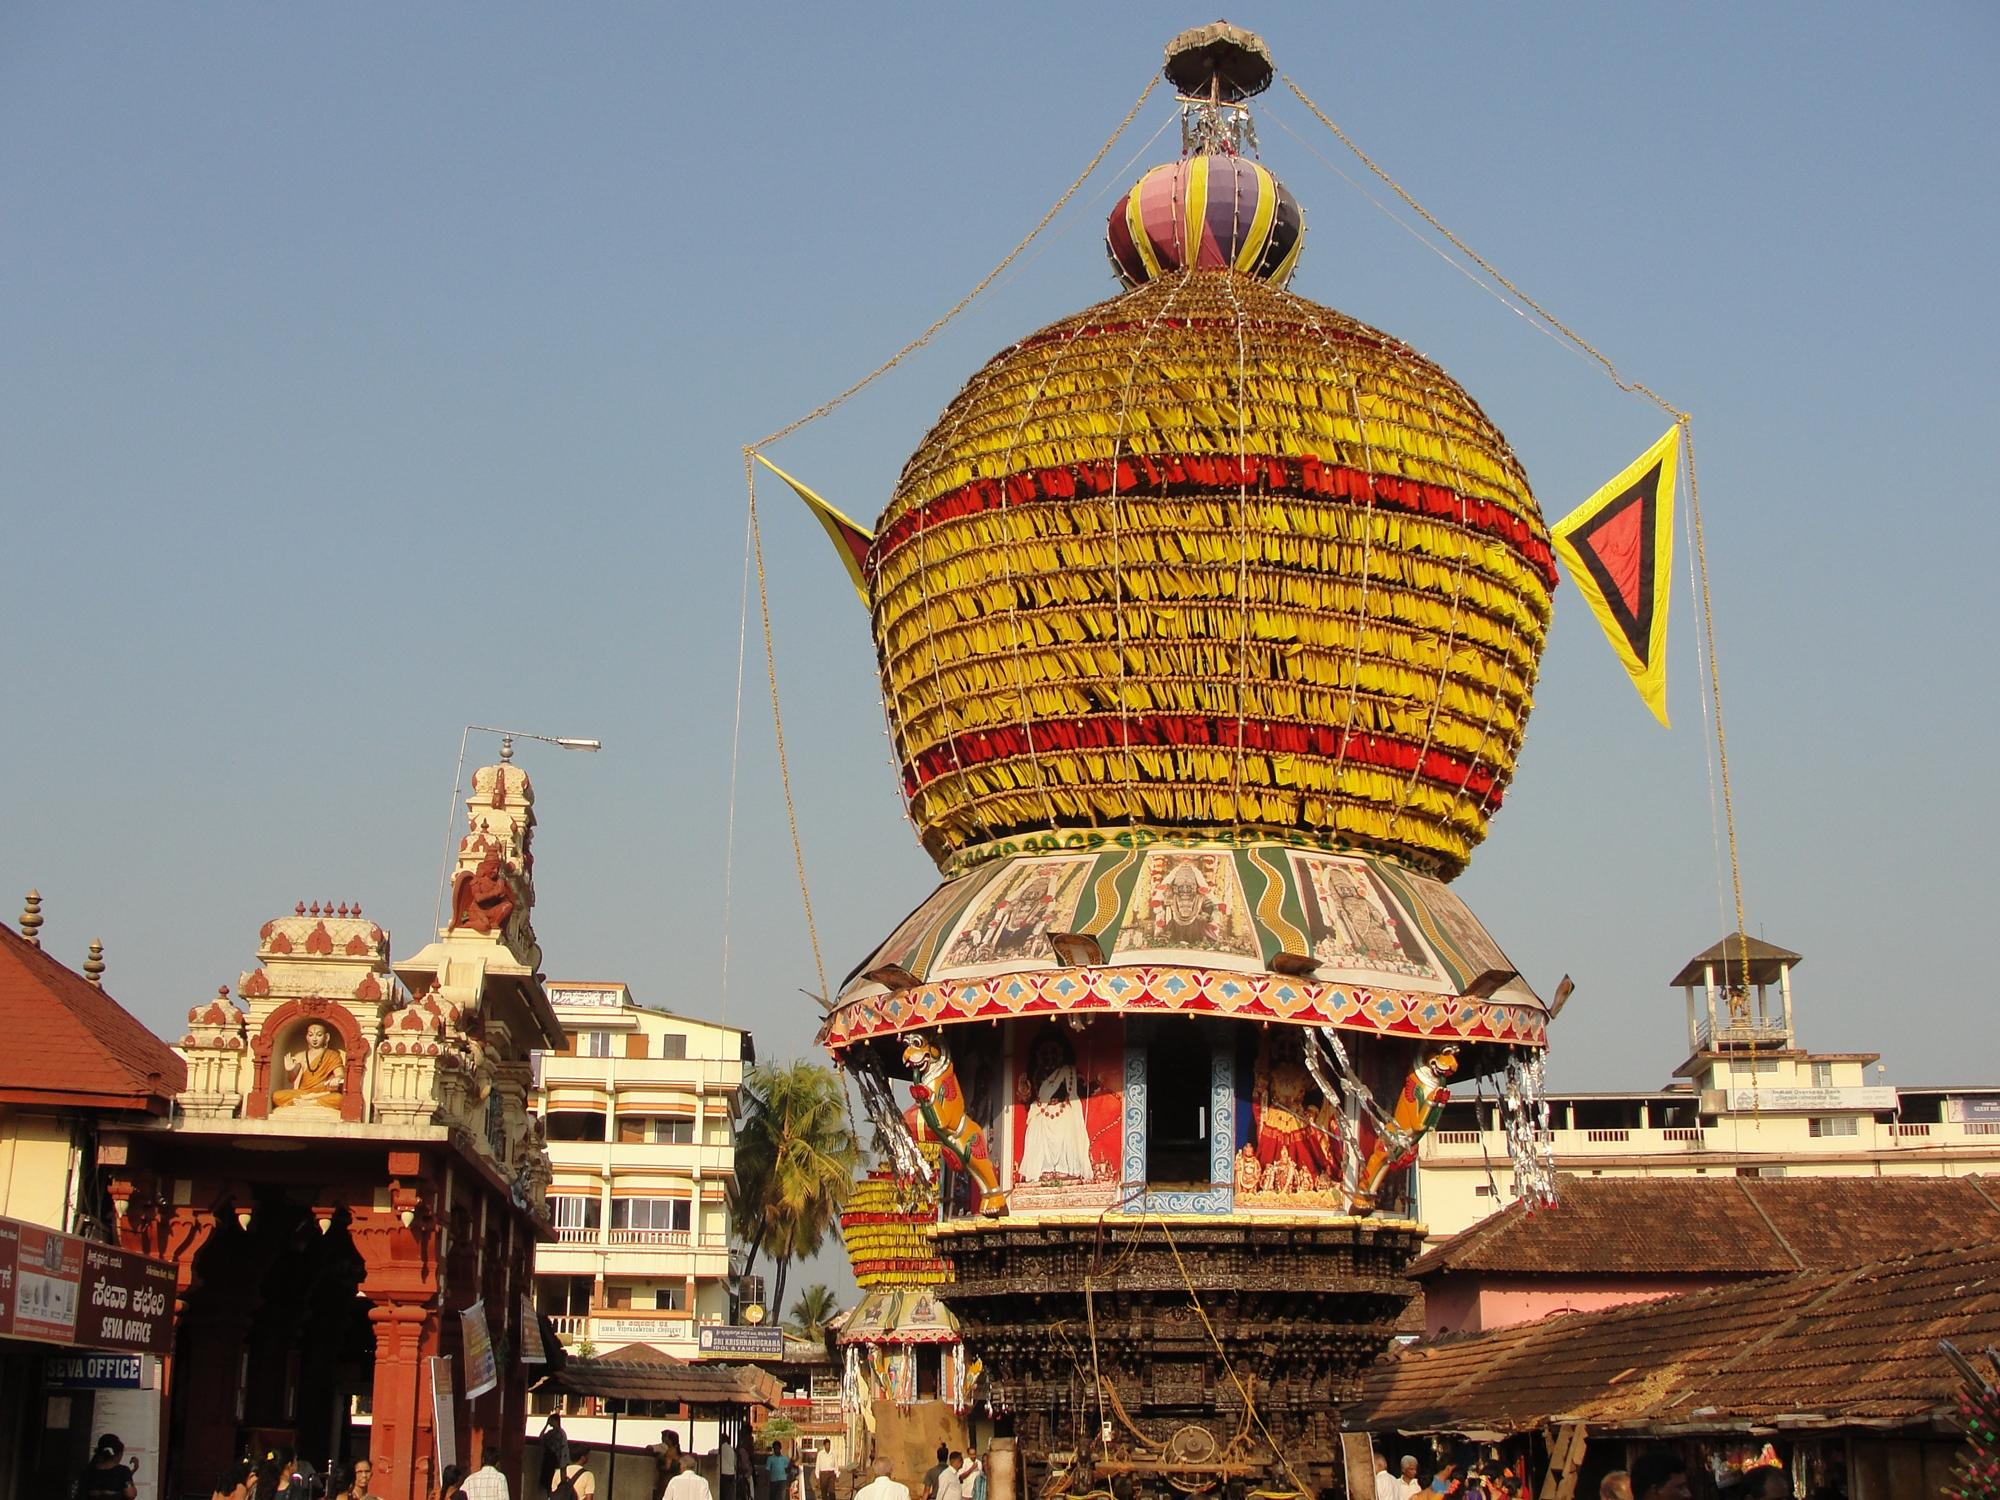 Plný kemp do kempu v Indii